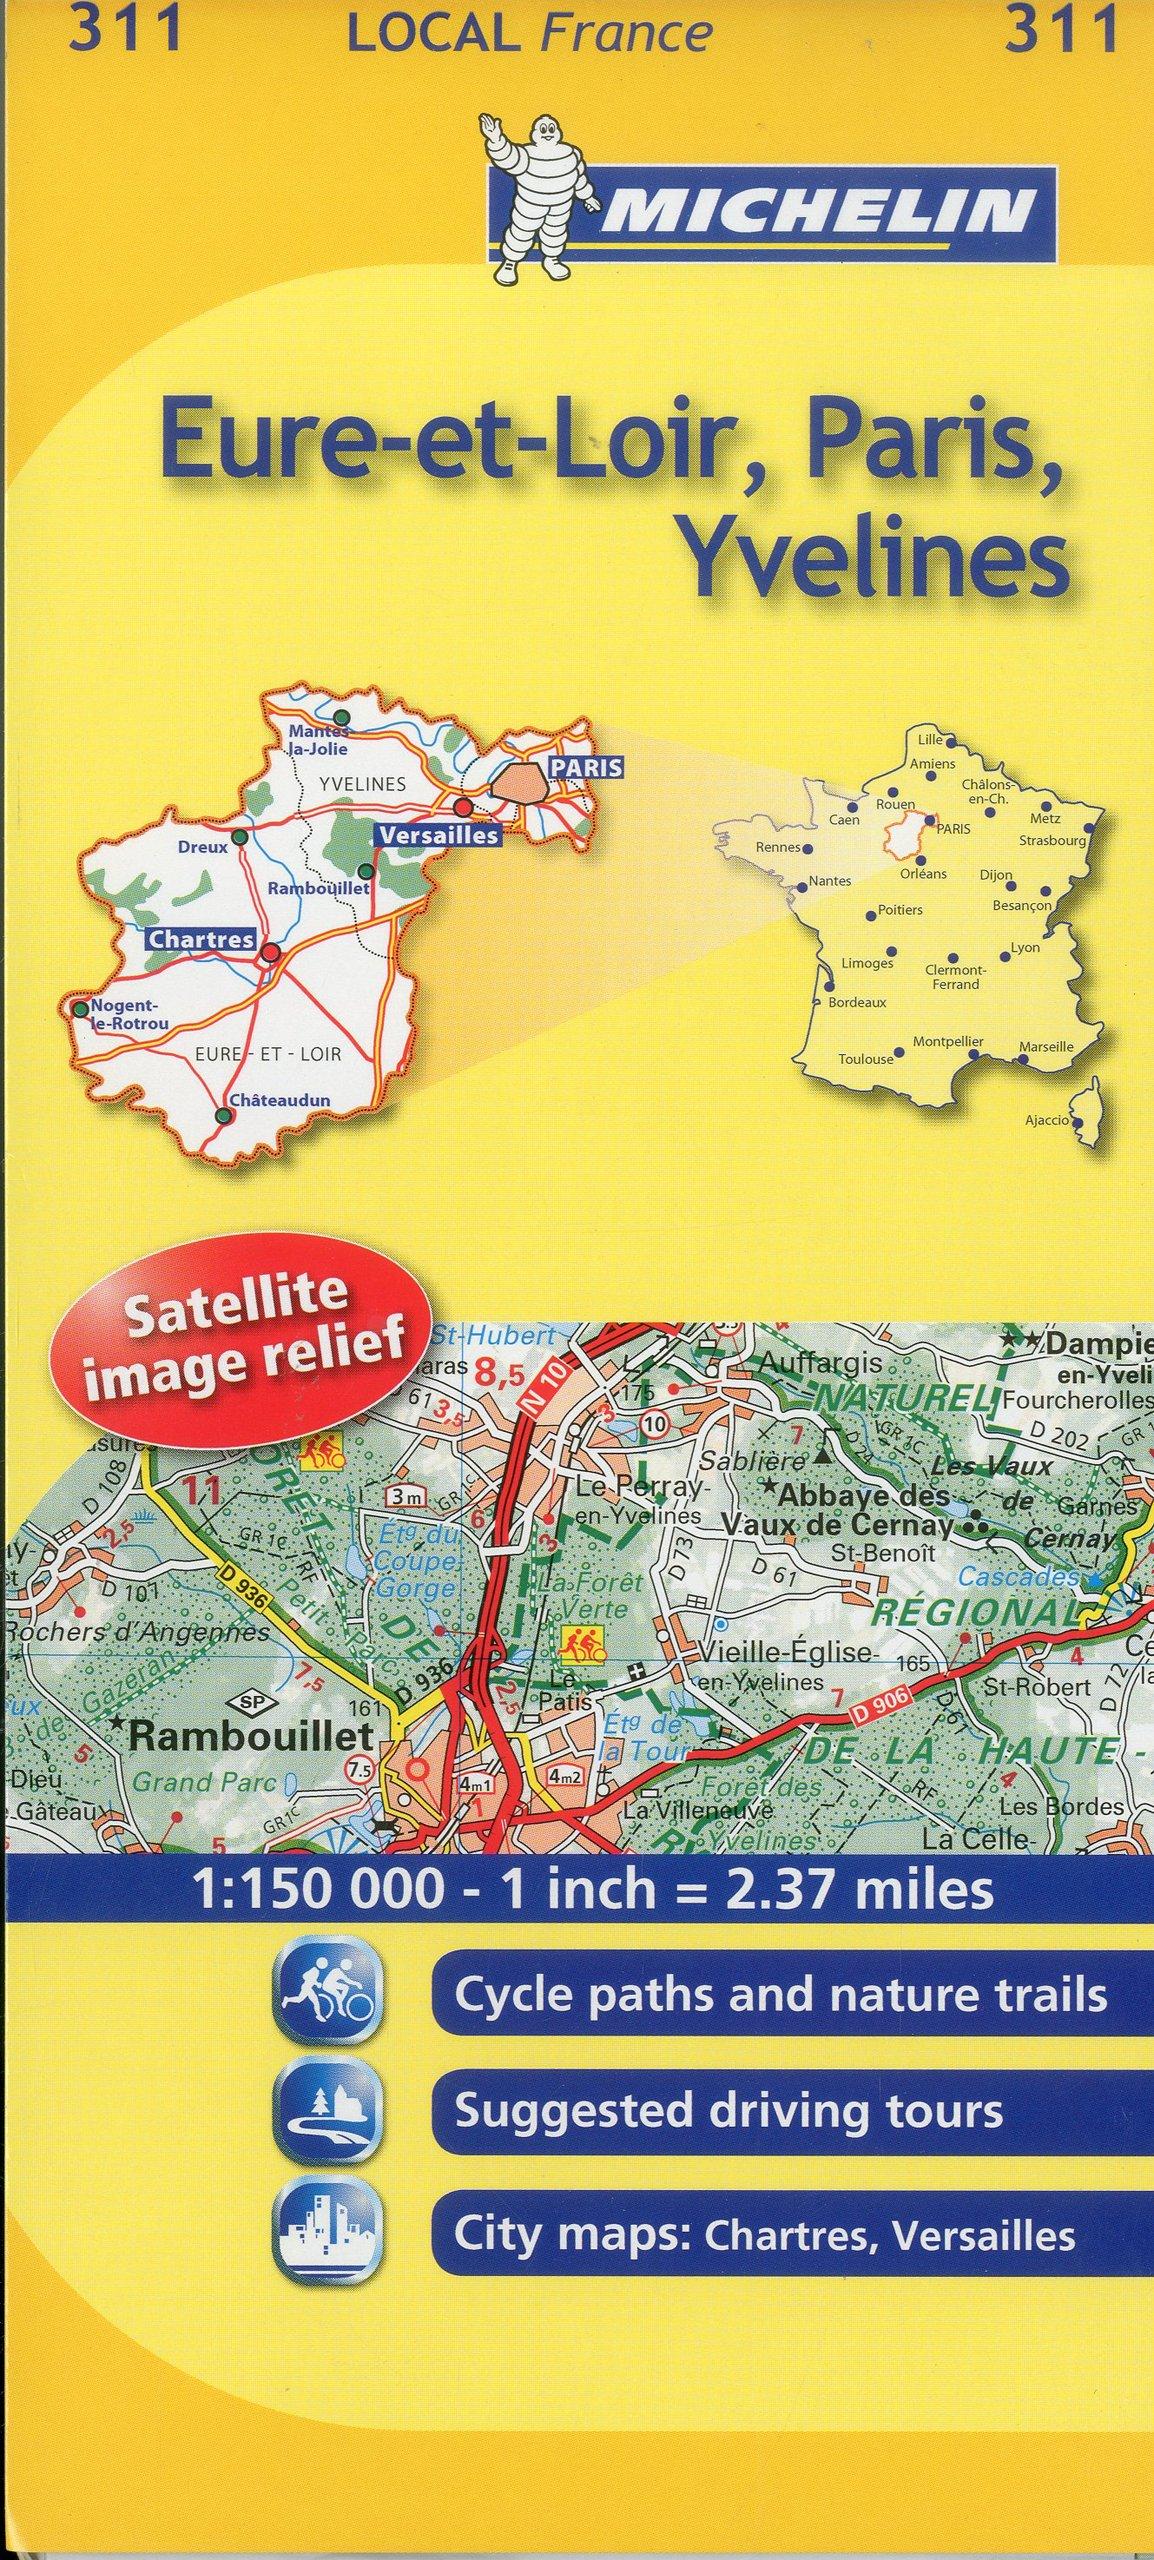 Map Of Yvelines France.Michelin Map France Eure Et Loir Paris Yvelines 311 Maps Local